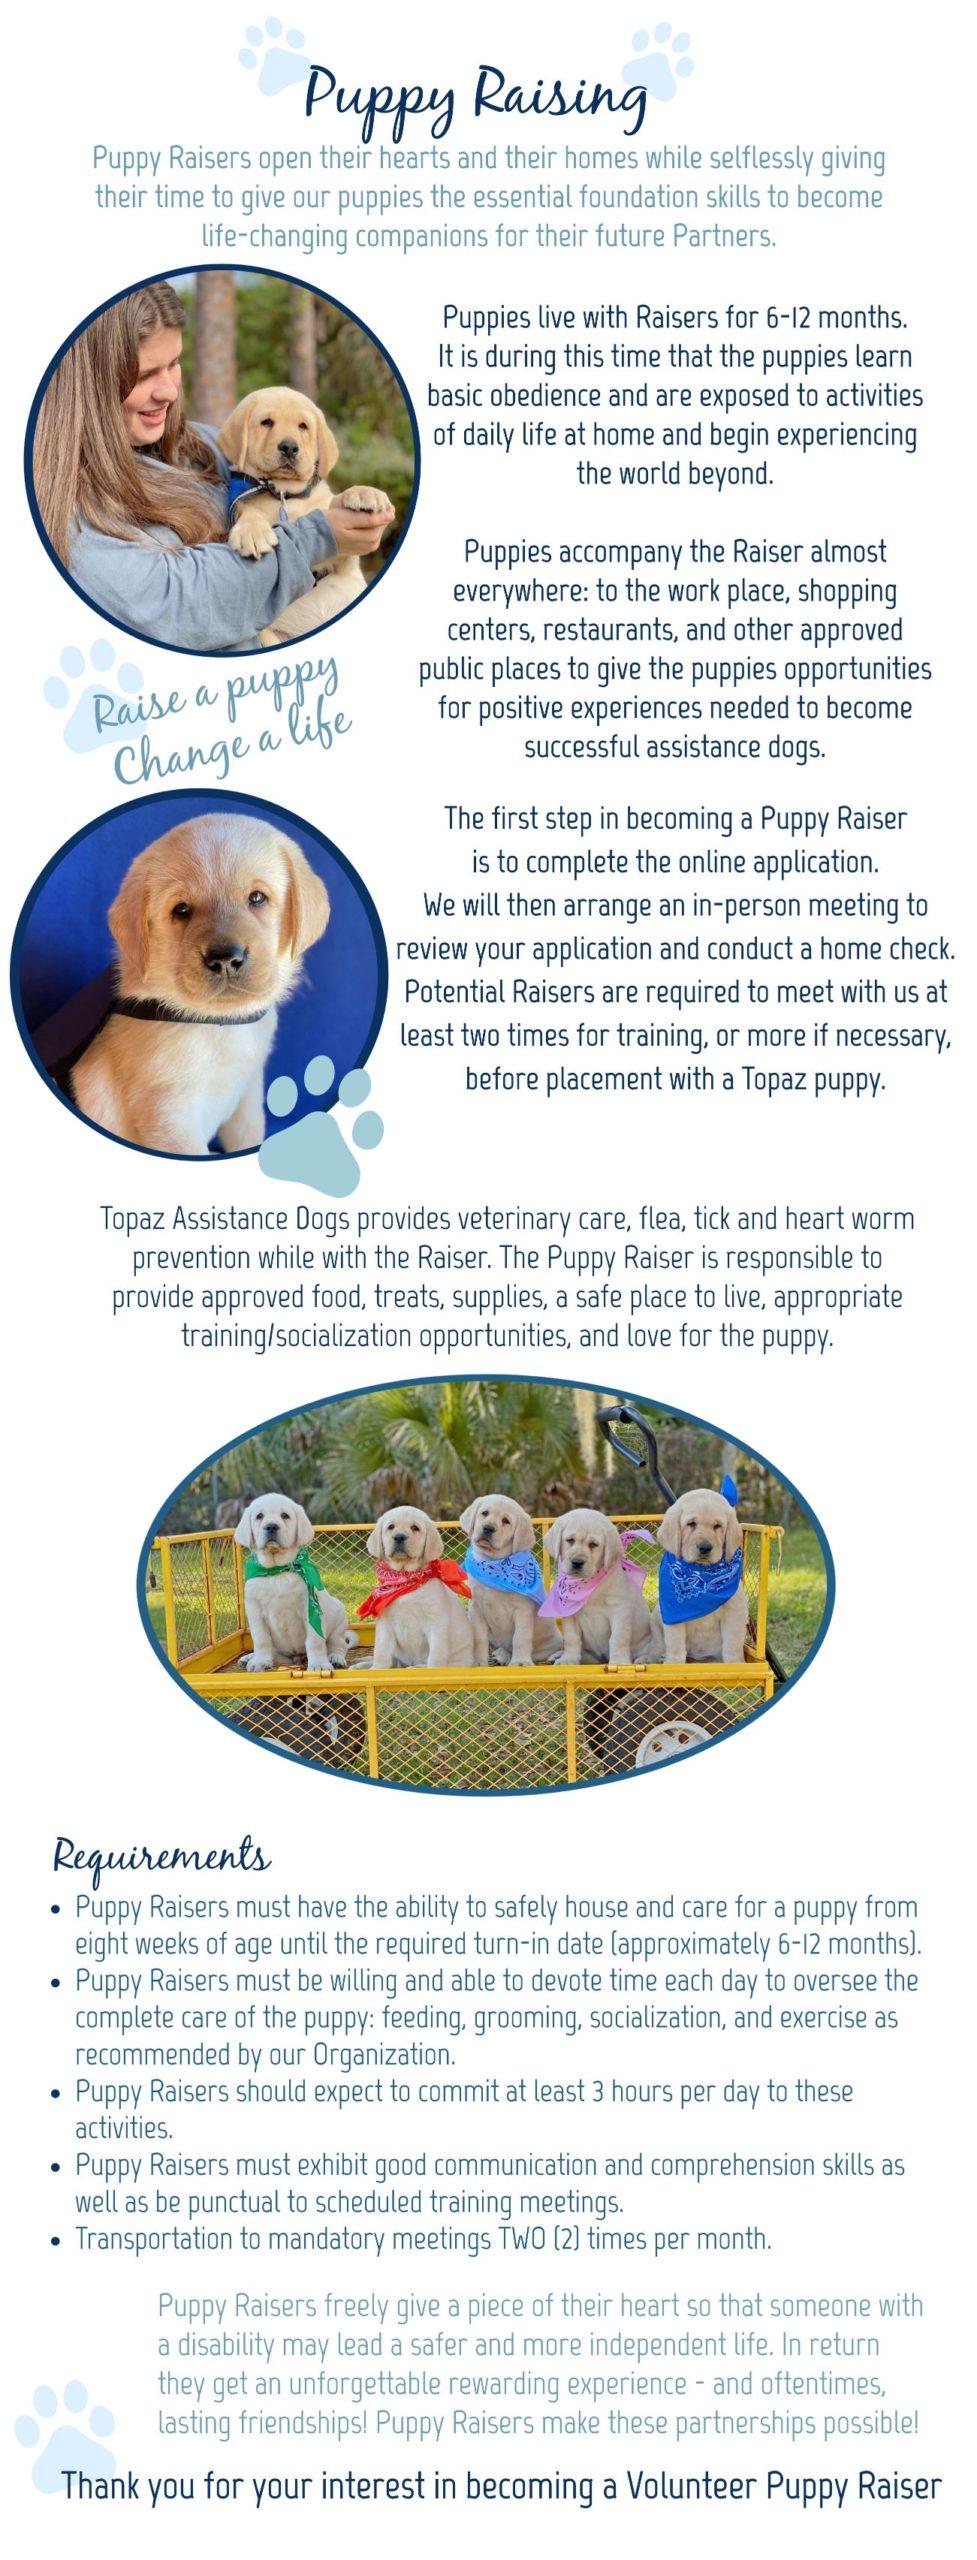 Puppy-Raising